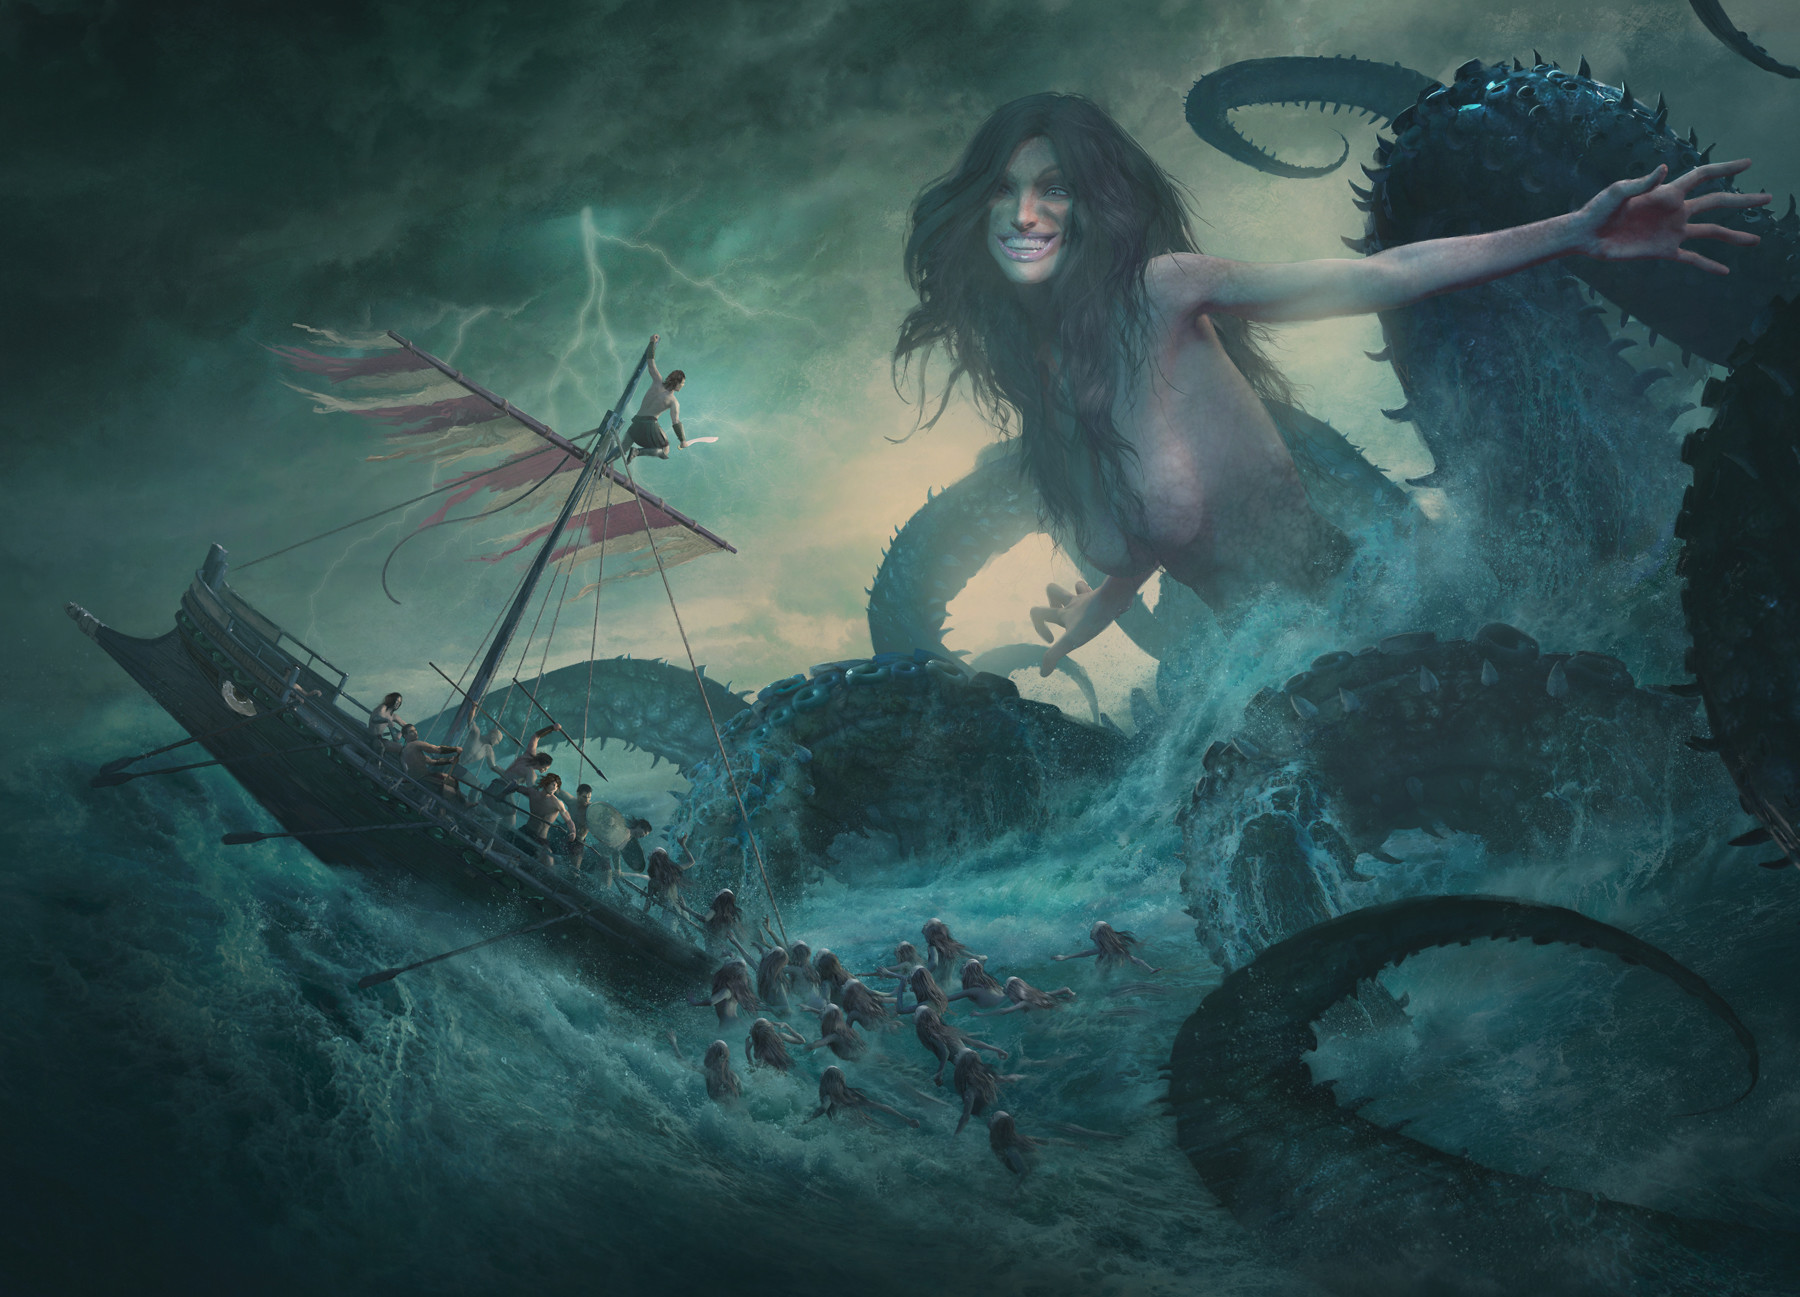 Mythic Battles Pantheon: Poseidon Expansion Cover